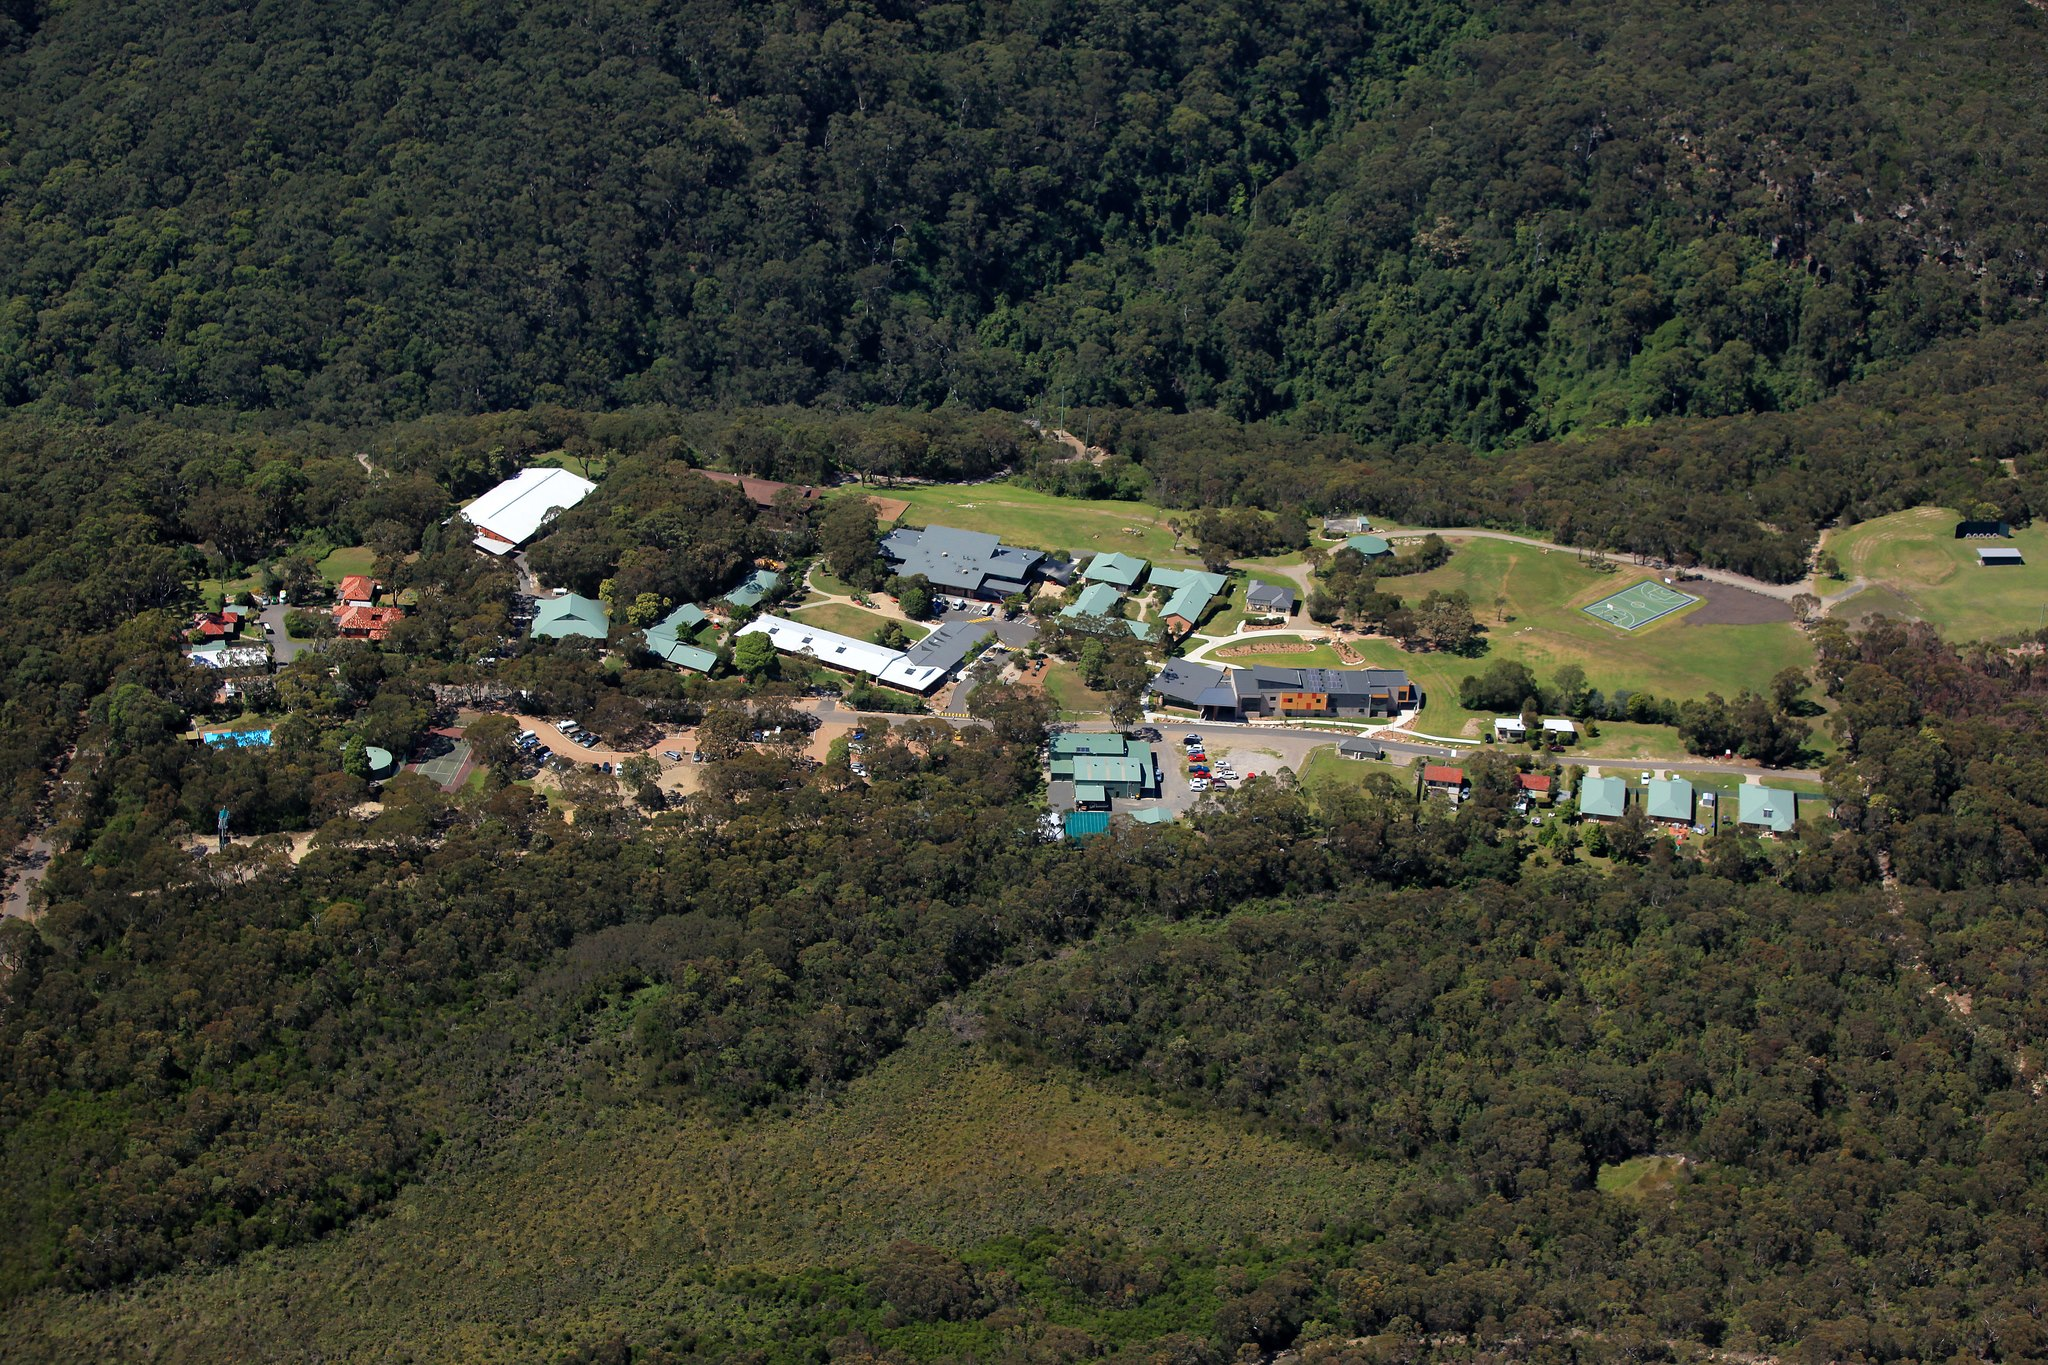 AerialPic.jpg